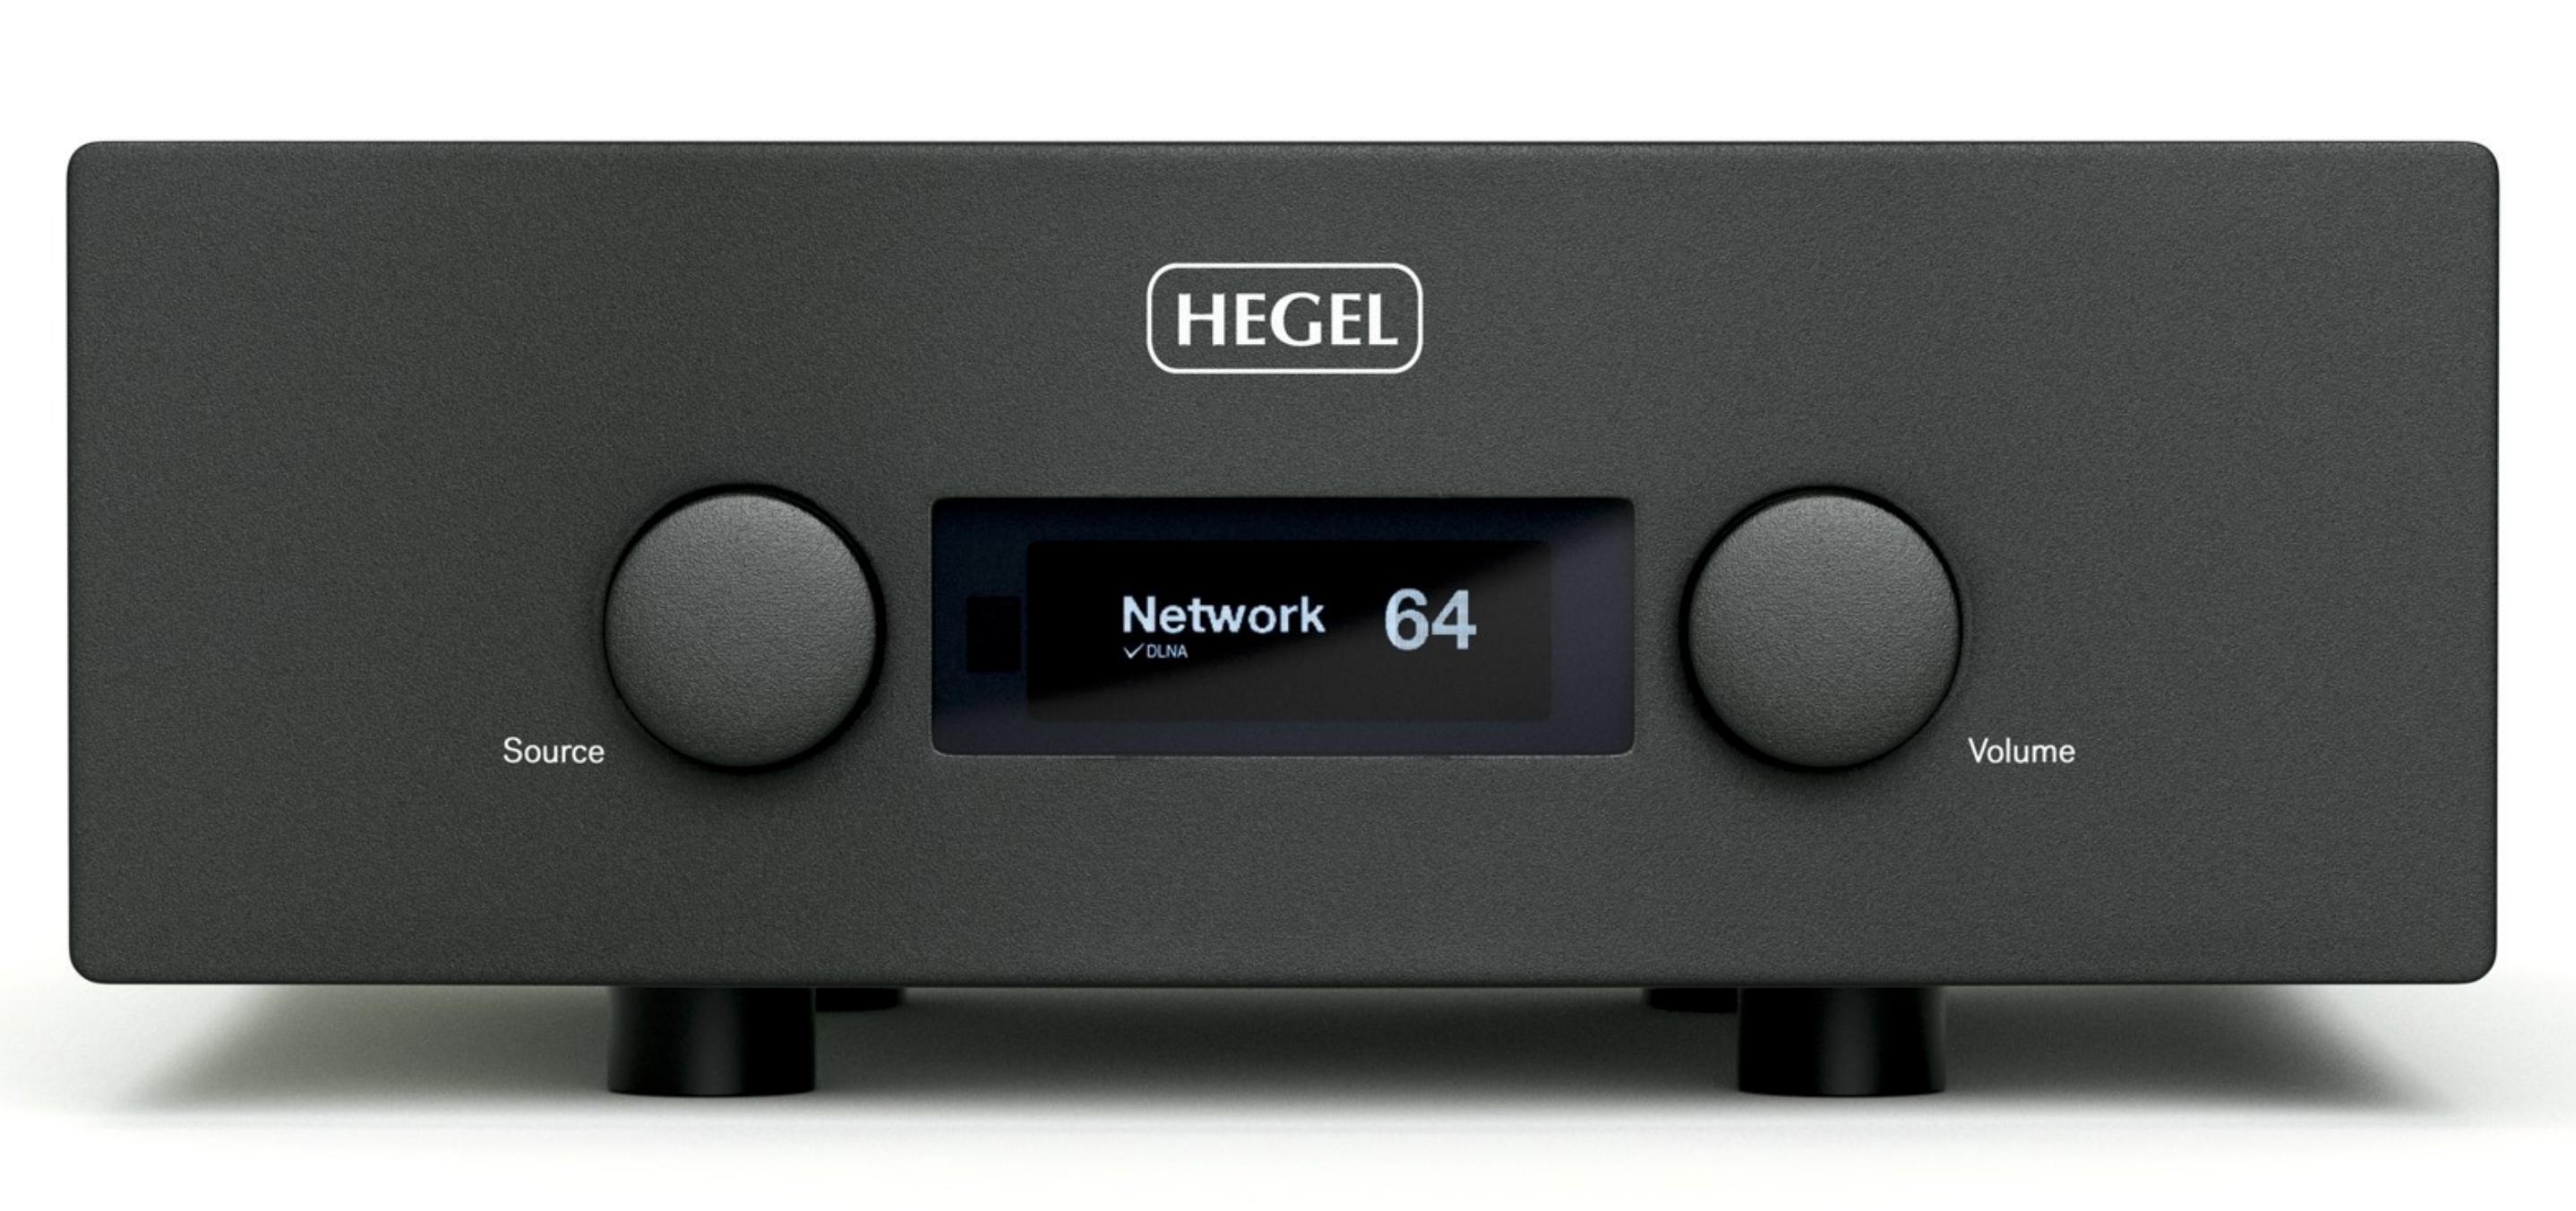 Hegel1.png